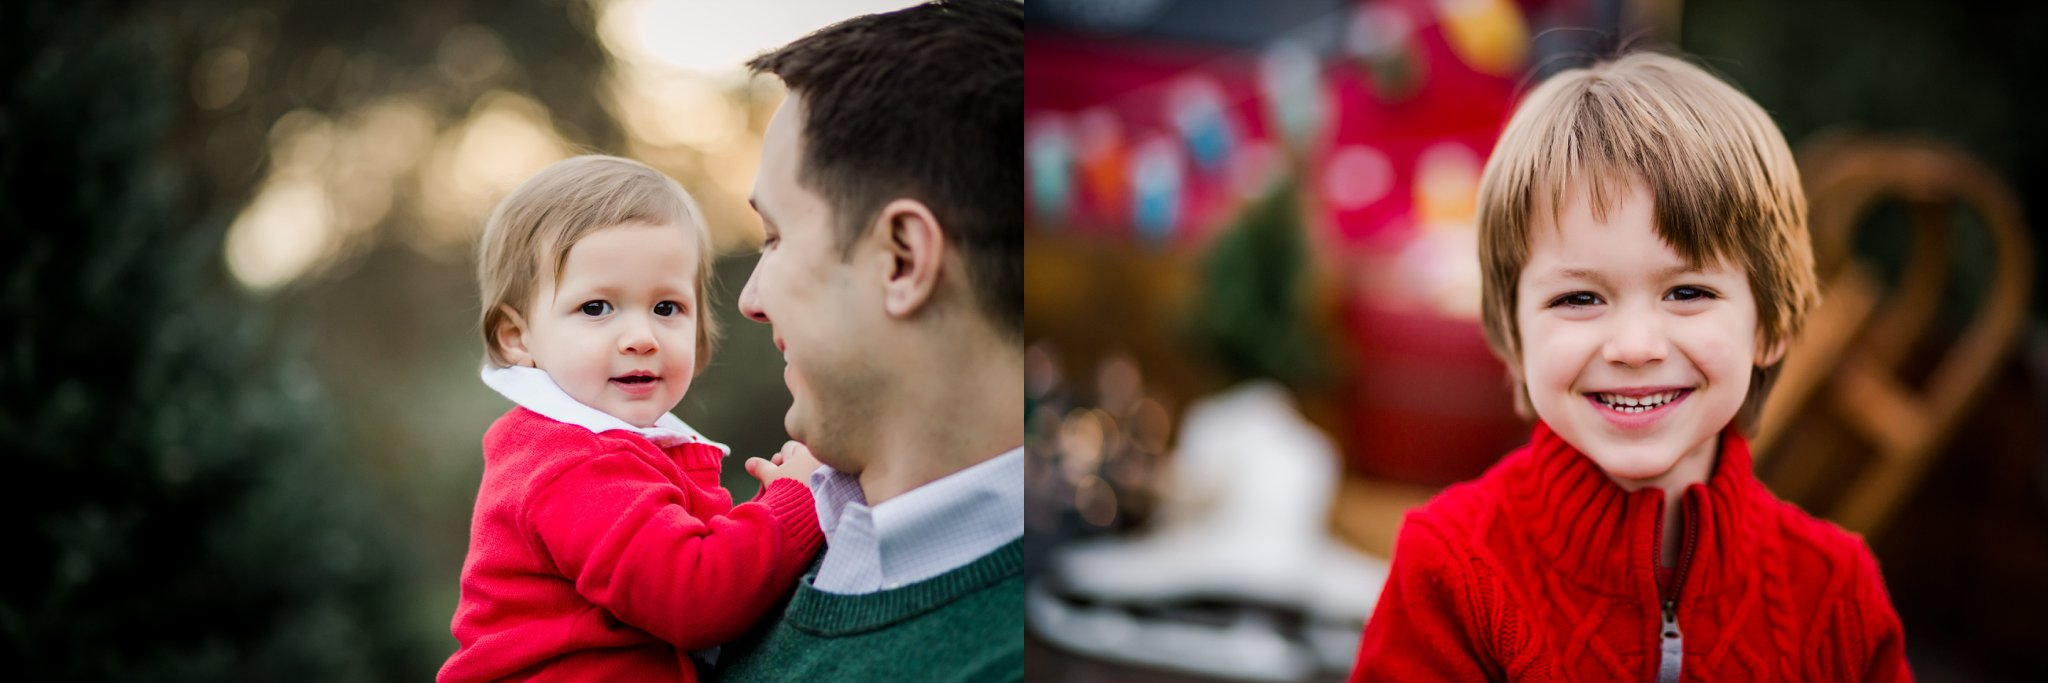 Christmas Tree Farm Holiday Mini Sessions   Tonya Teran Photography, Germantown, MD Newborn, Baby, and Family Photographer